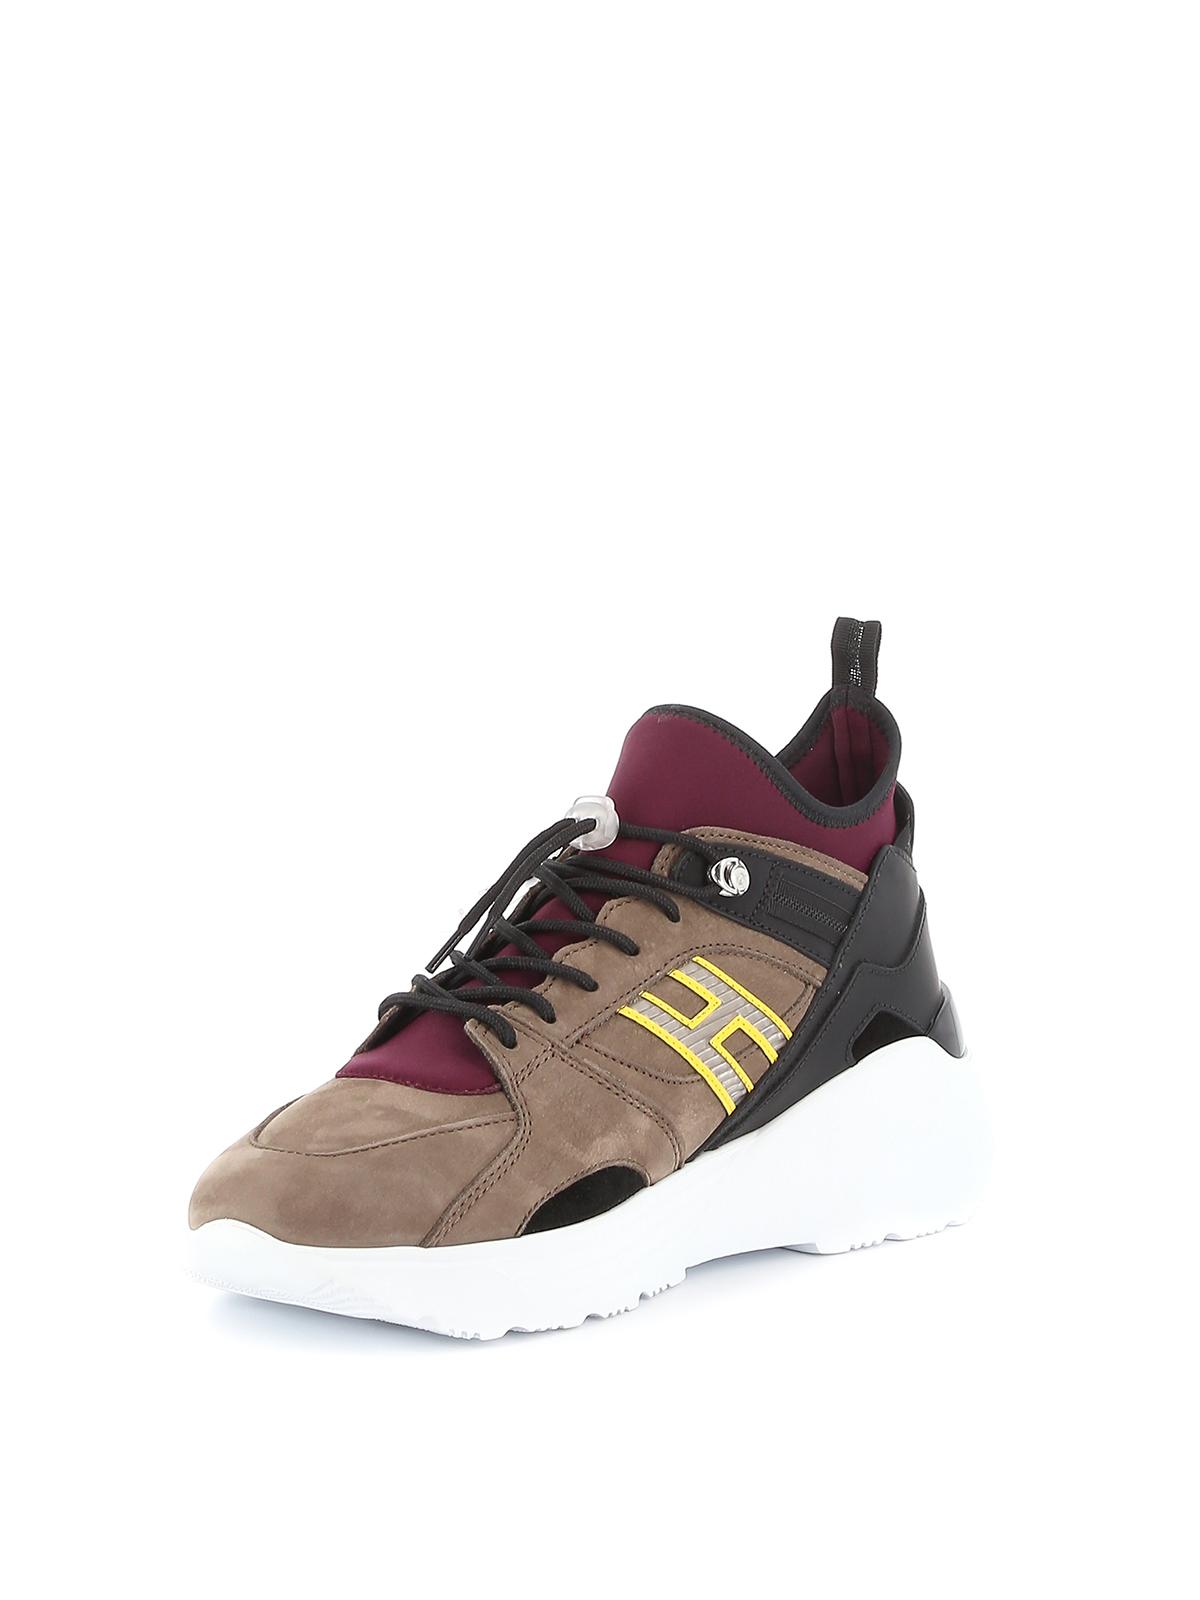 Trainers Hogan - H443 multi fabric sneakers - HXM4430BX90LMB749K